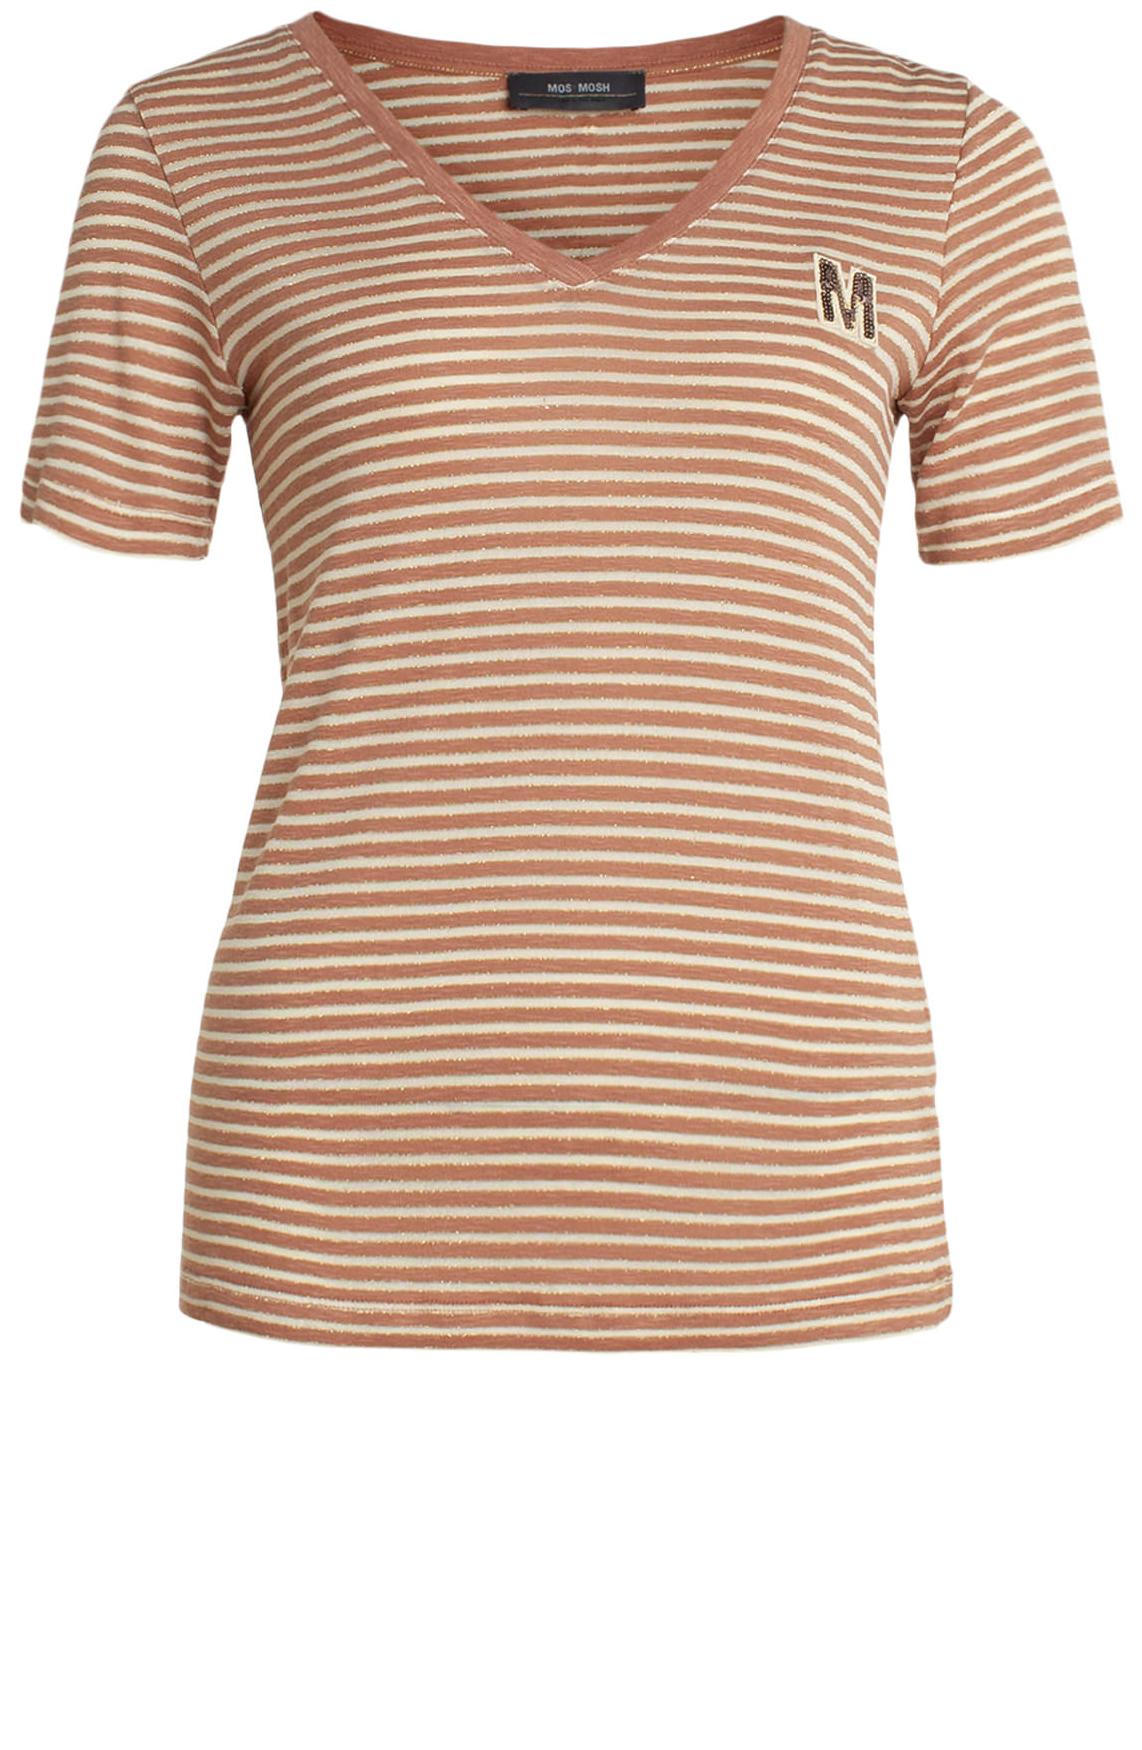 Mos Mosh Dames Alisha gestreept lurex shirt roze